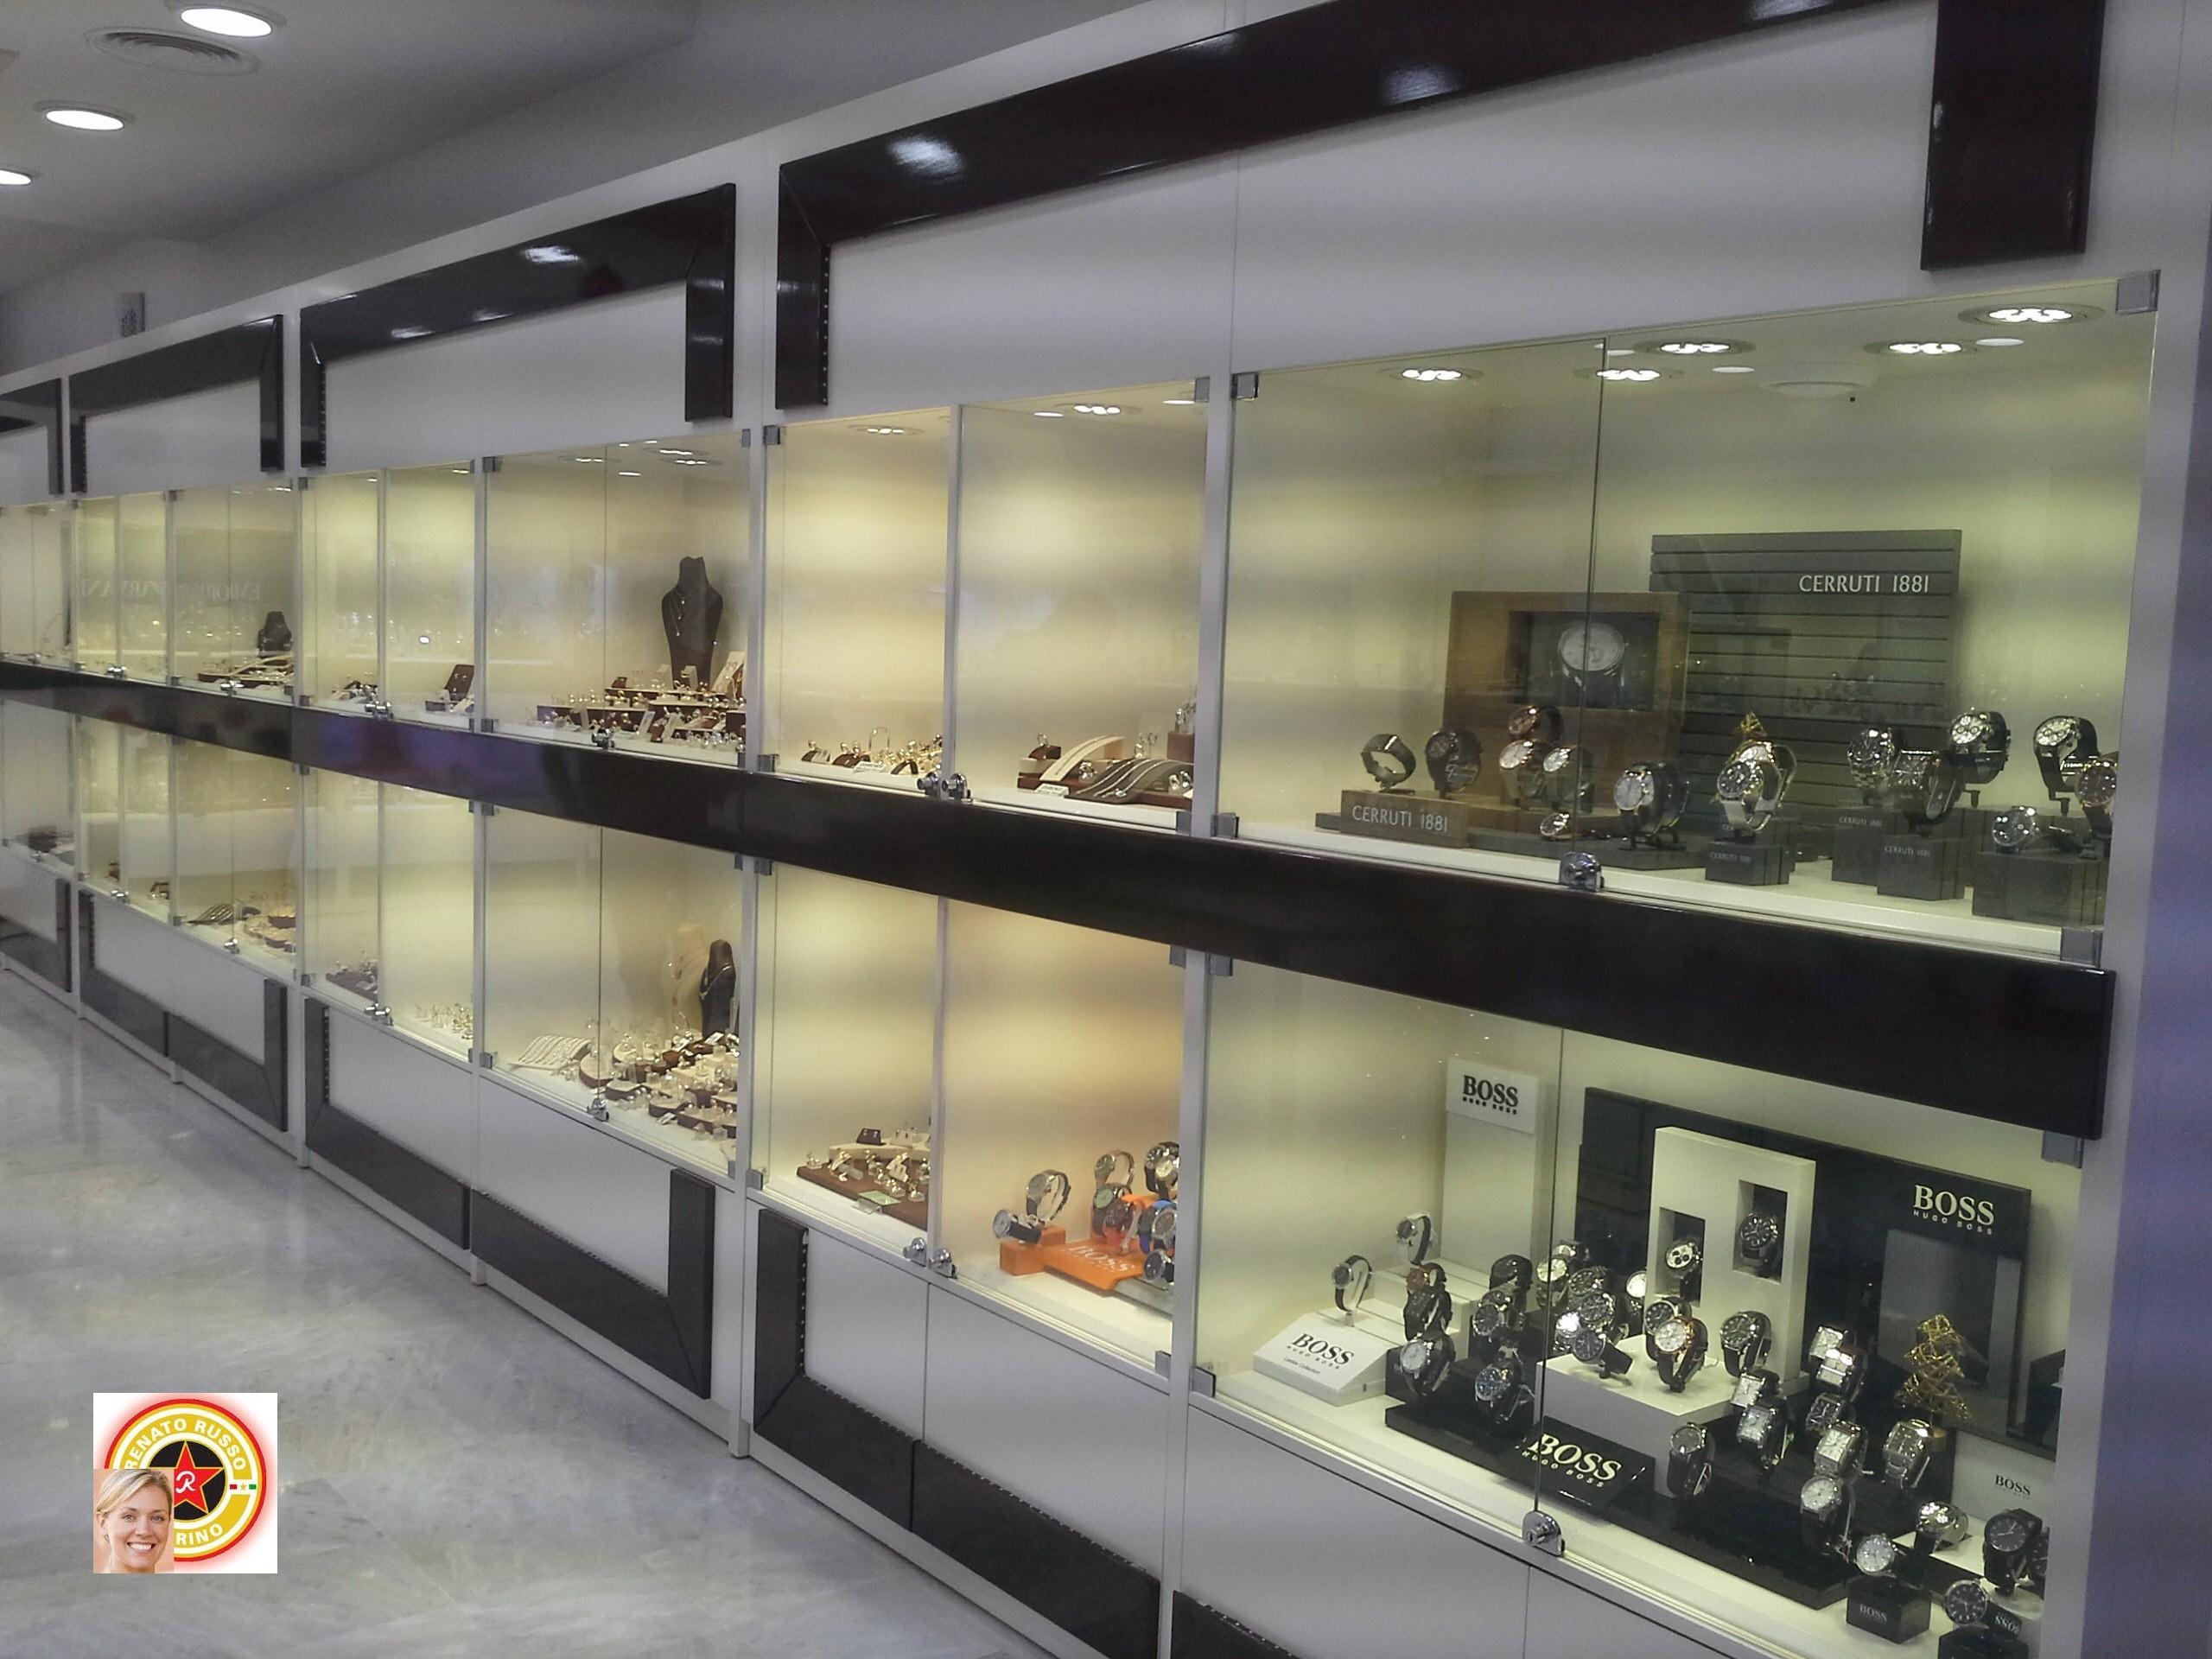 Arredamenti per gioiellerie compra in fabbrica for Fabbrica mobili torino